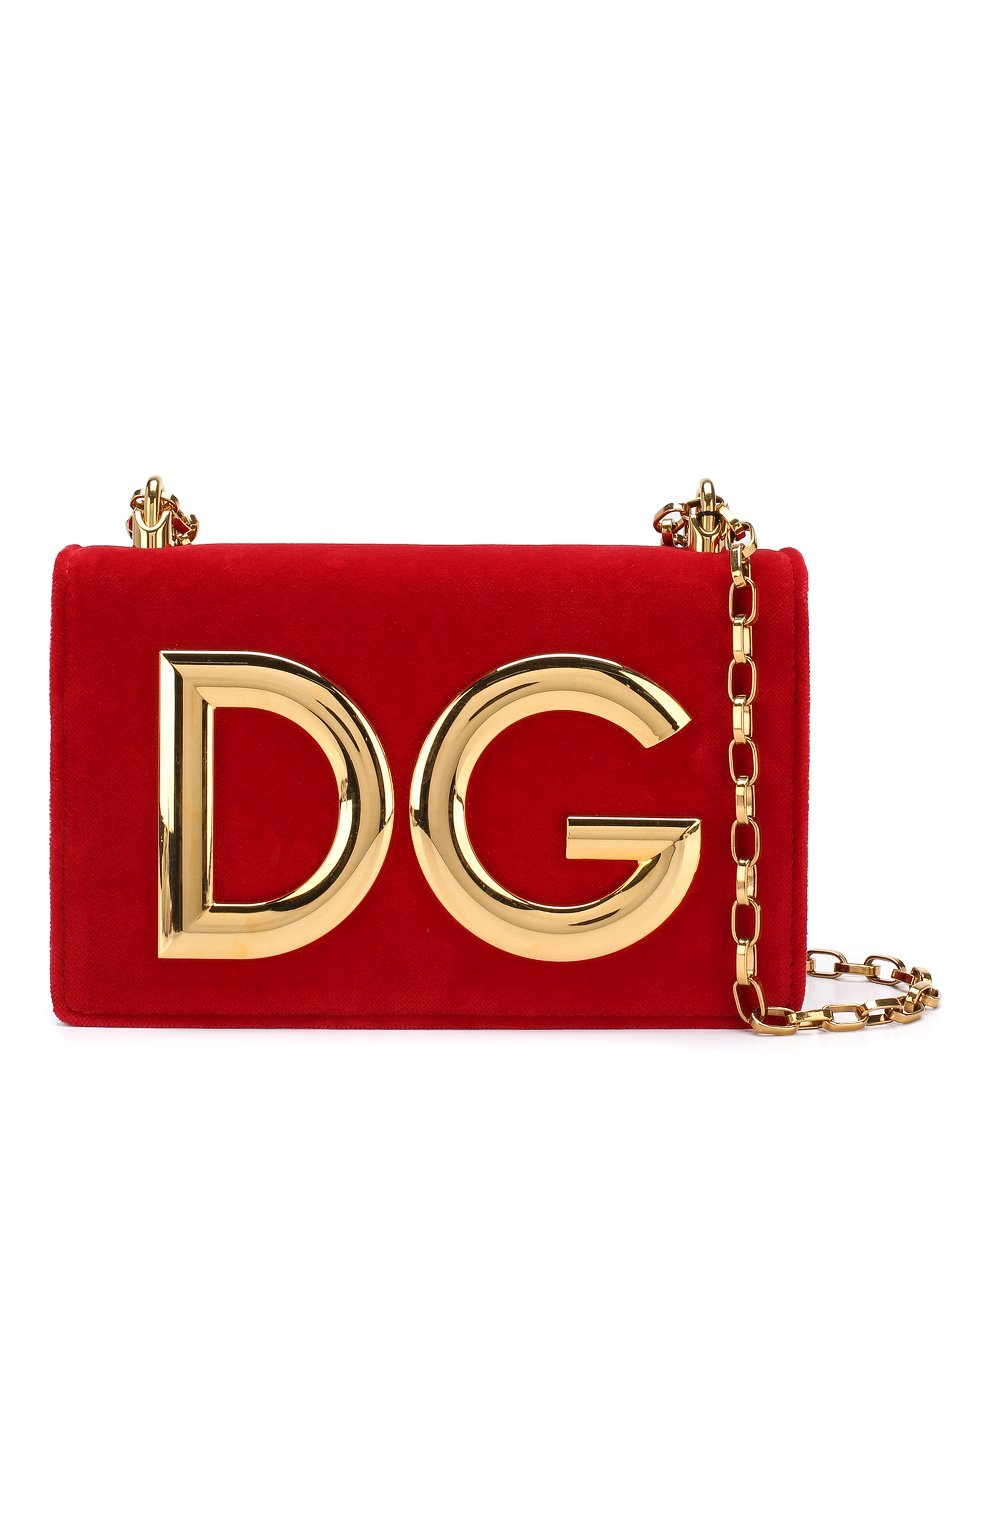 Сумка DG Girls из бархата Dolce & Gabbana красная цвета | Фото №5